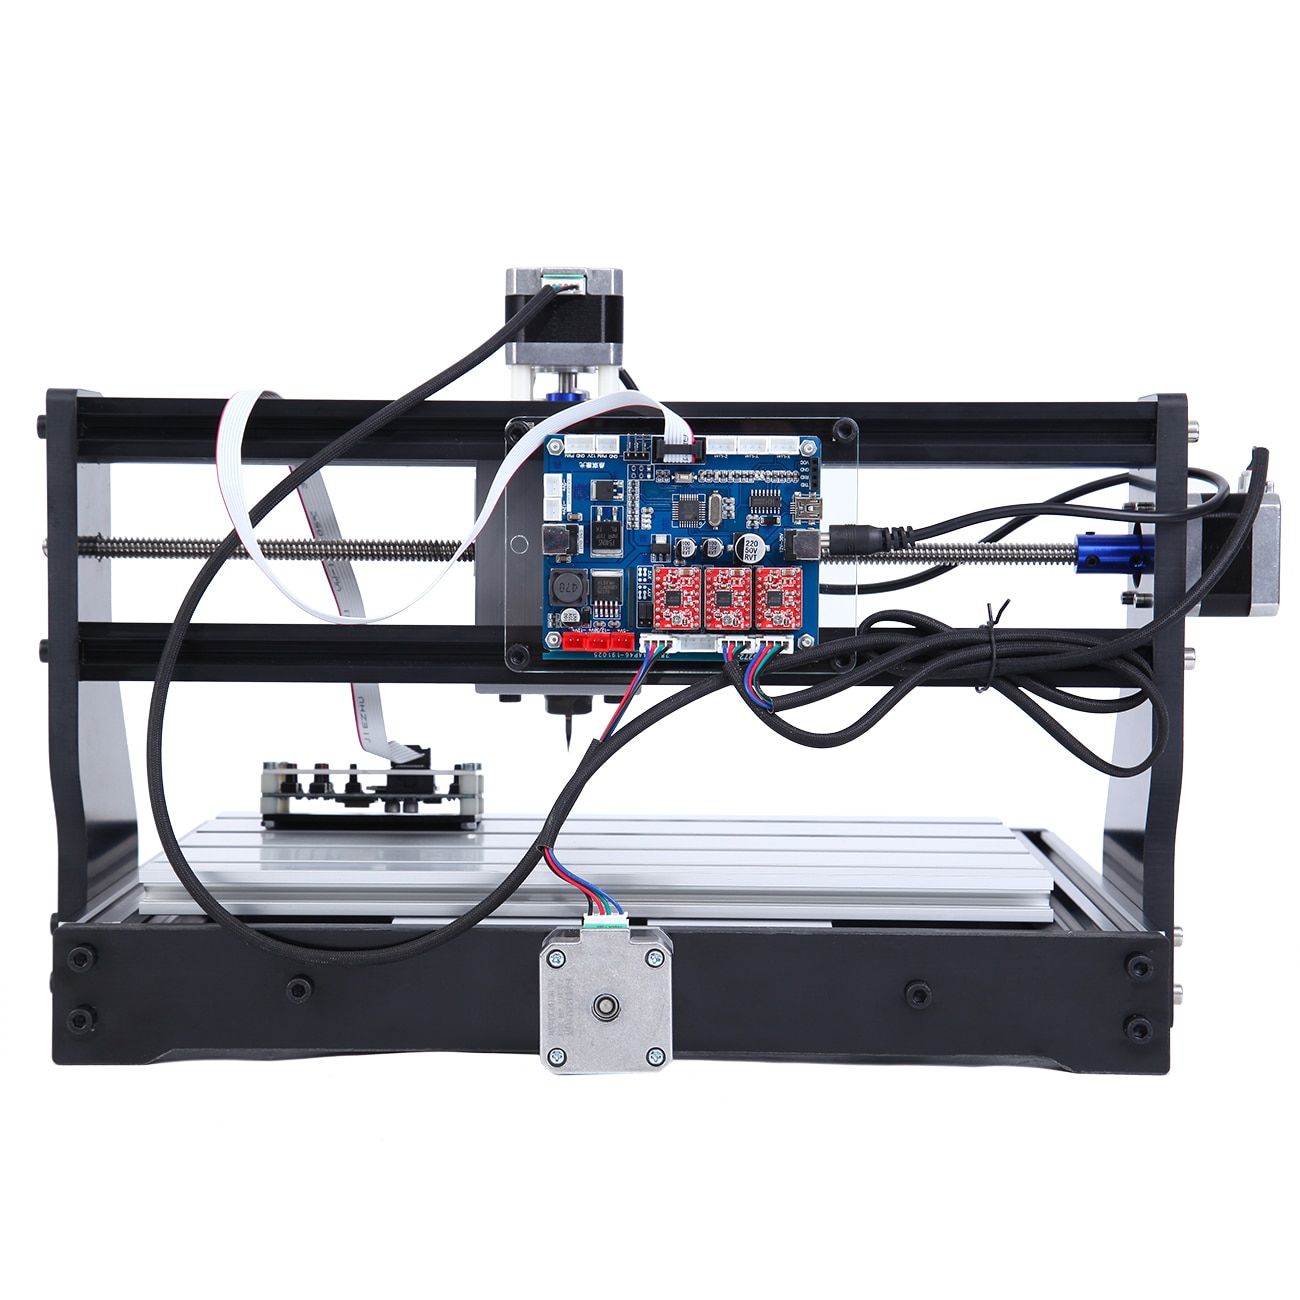 Honhill Laser Engraving Machine 30x40cm DIY Wood Laser Cutting Machine Engraver for Wood PCB PVC Mini CNC3018 Desktop Engraver enlarge